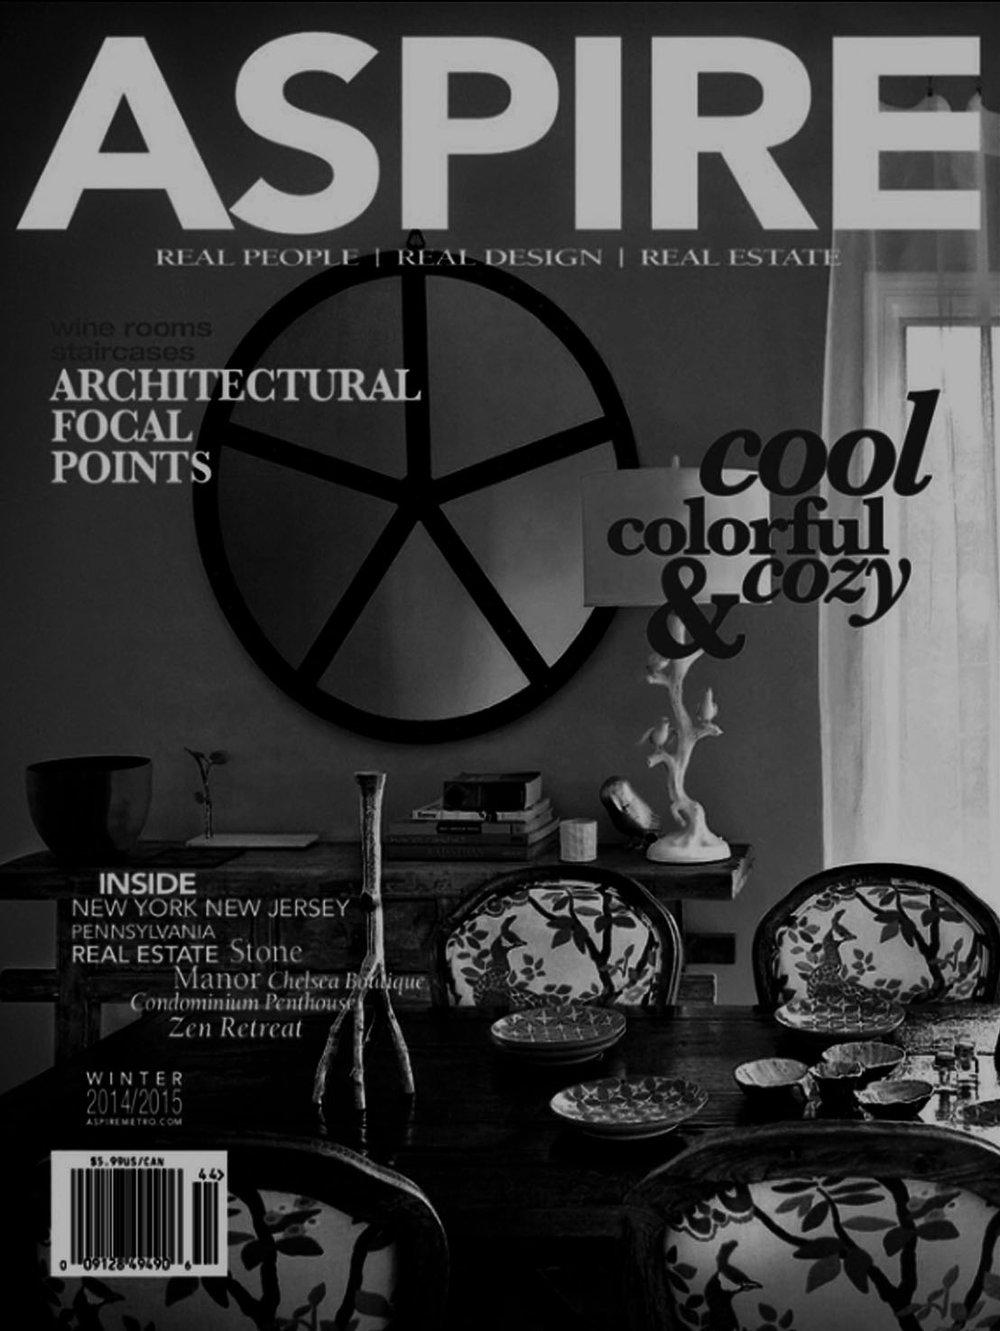 Hotel Design Firms in New York, NY | Joe Ginsberg